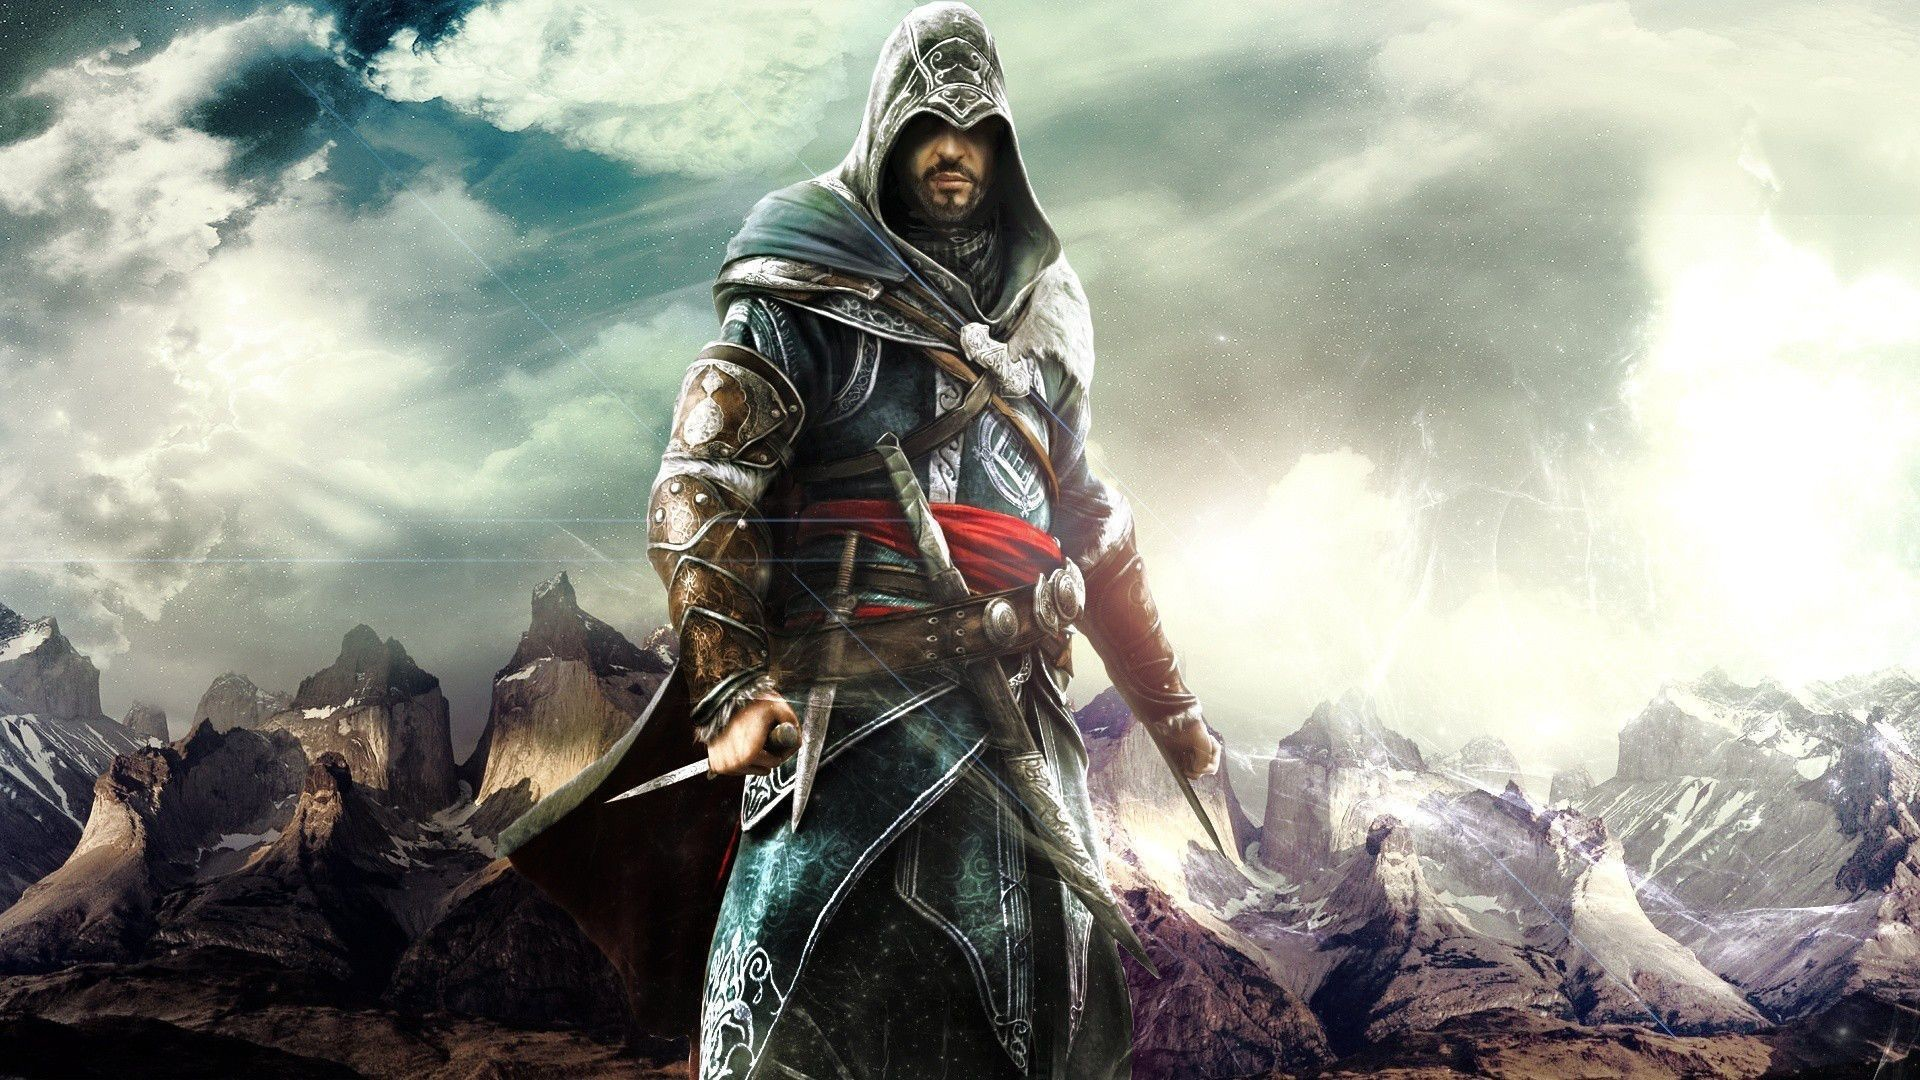 hd wallpaper Games Wallpapers For Mac Ezio The Best Assassin .